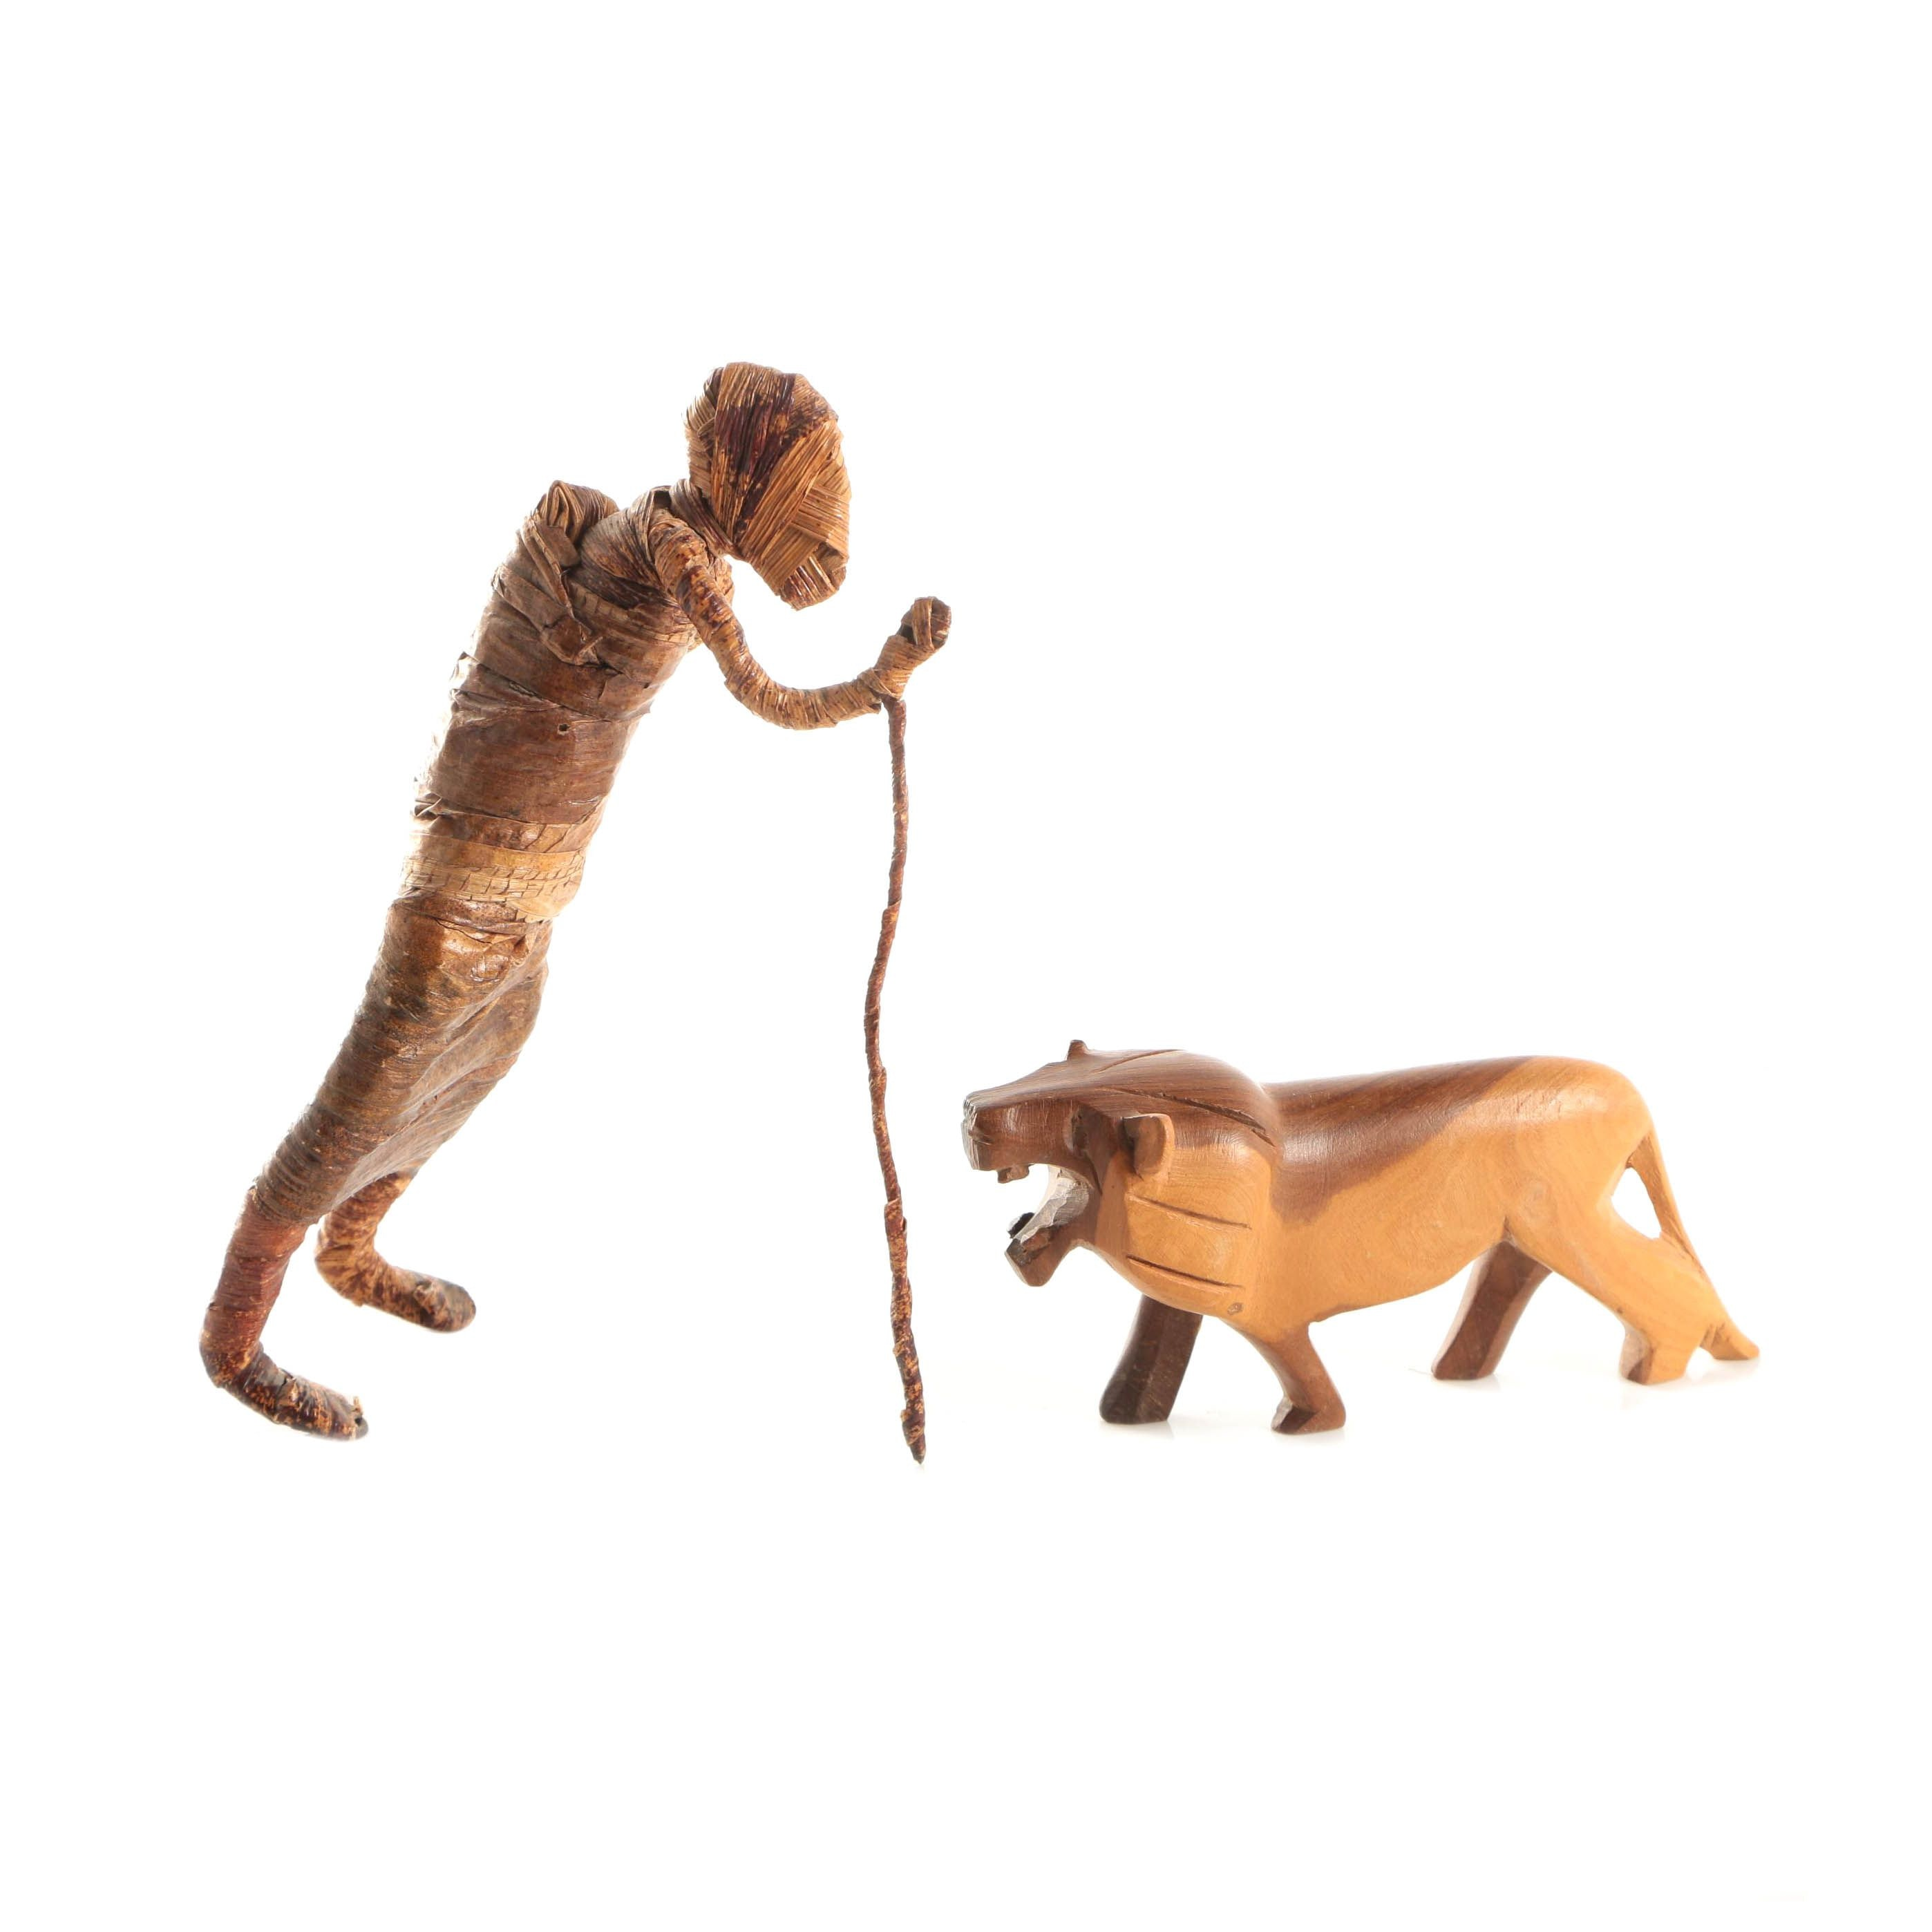 Kenyan Figural Sculpture with Carved Wood Lion